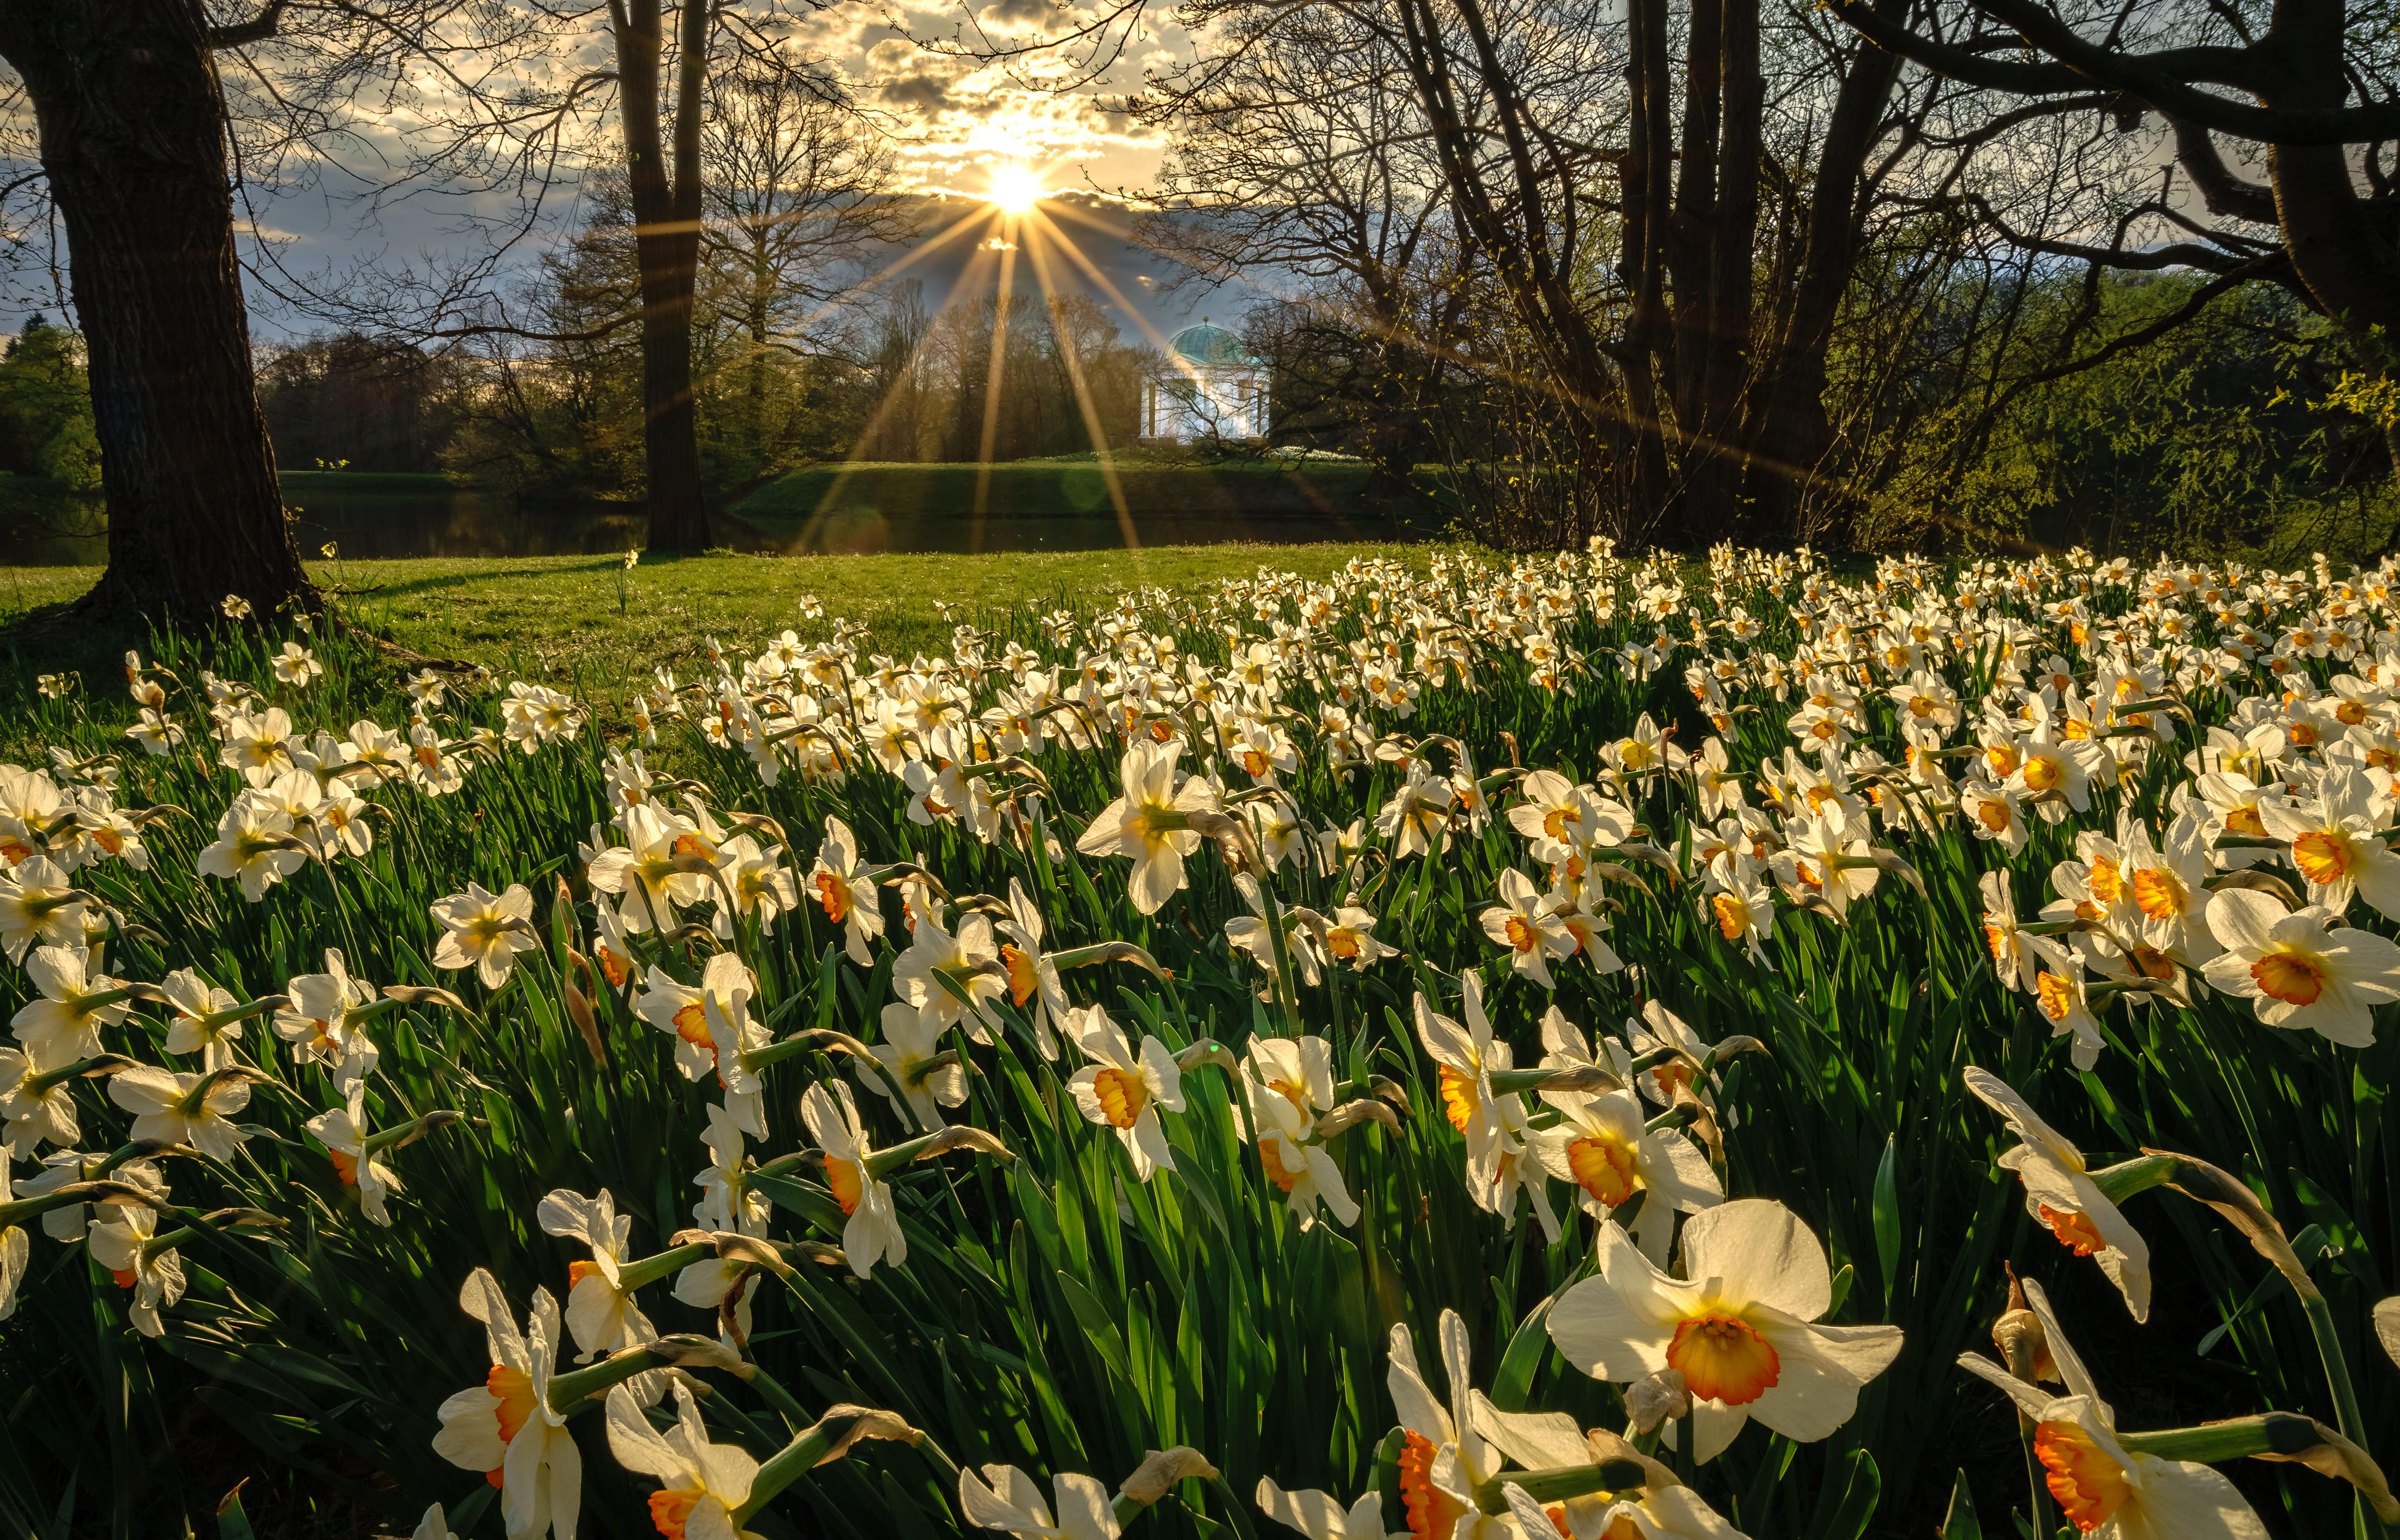 daffodils-photo-84